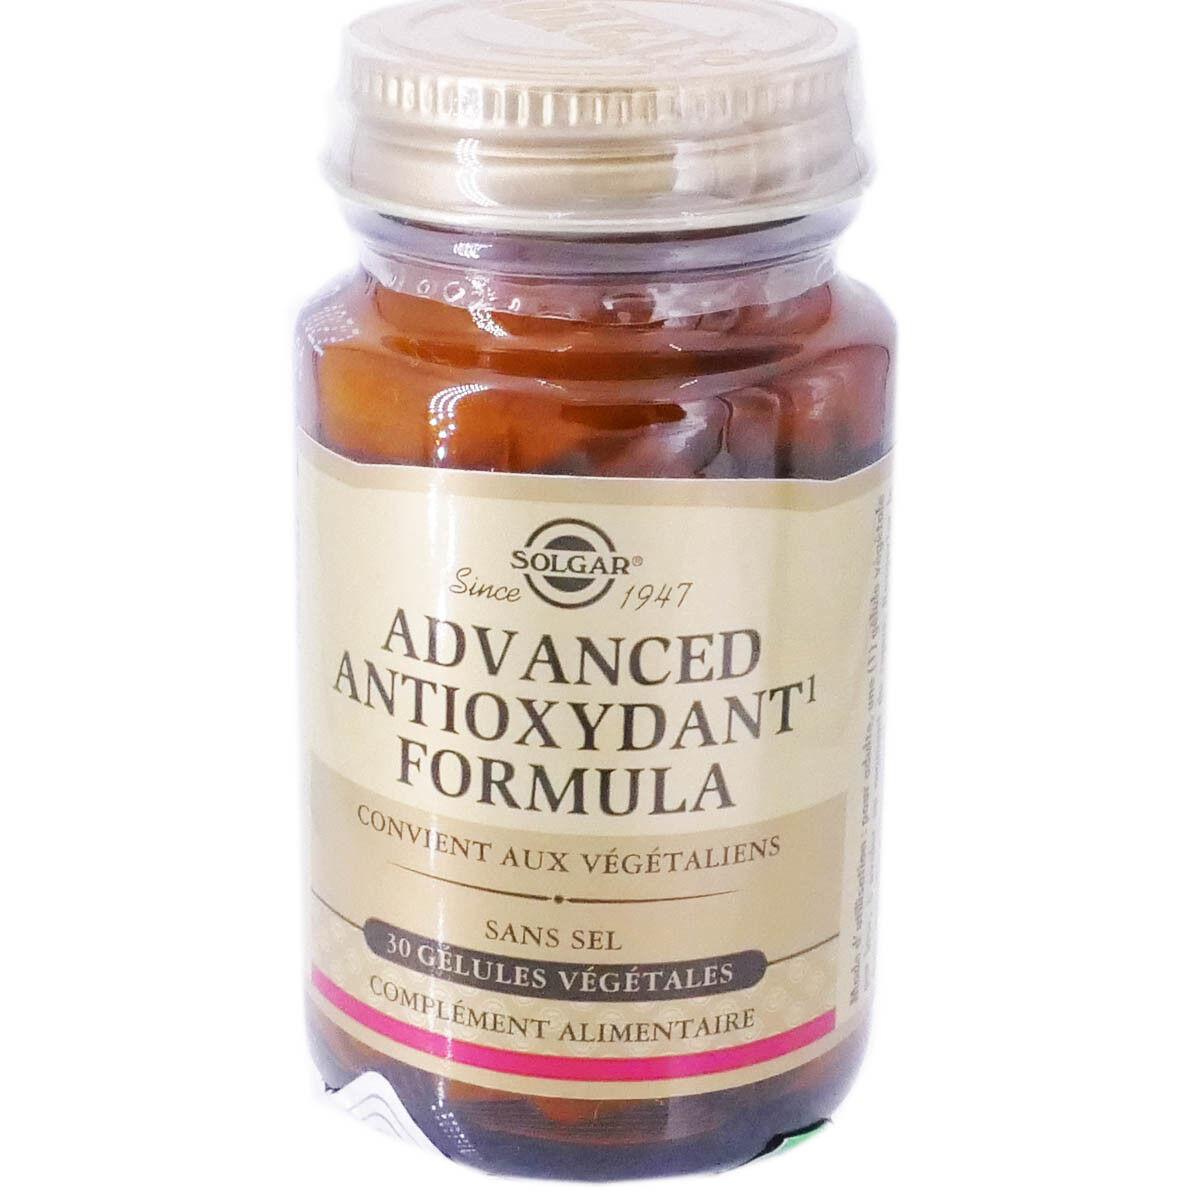 Solgar advanced antioxydant 30 gelules